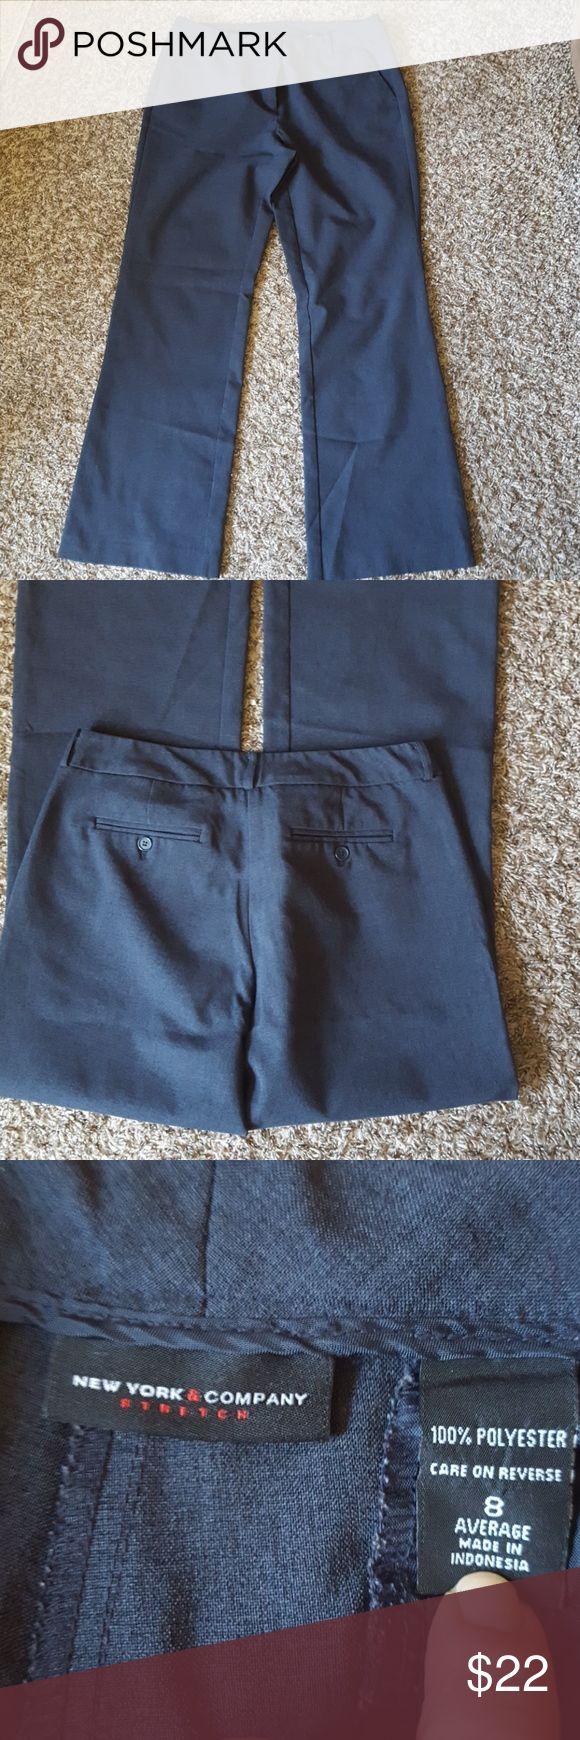 "Pants Heather navy trousers, ETC, size 8 Average, 29"" inseam, straight leg, 32"" waist, stretch New York & Company Pants Straight Leg"